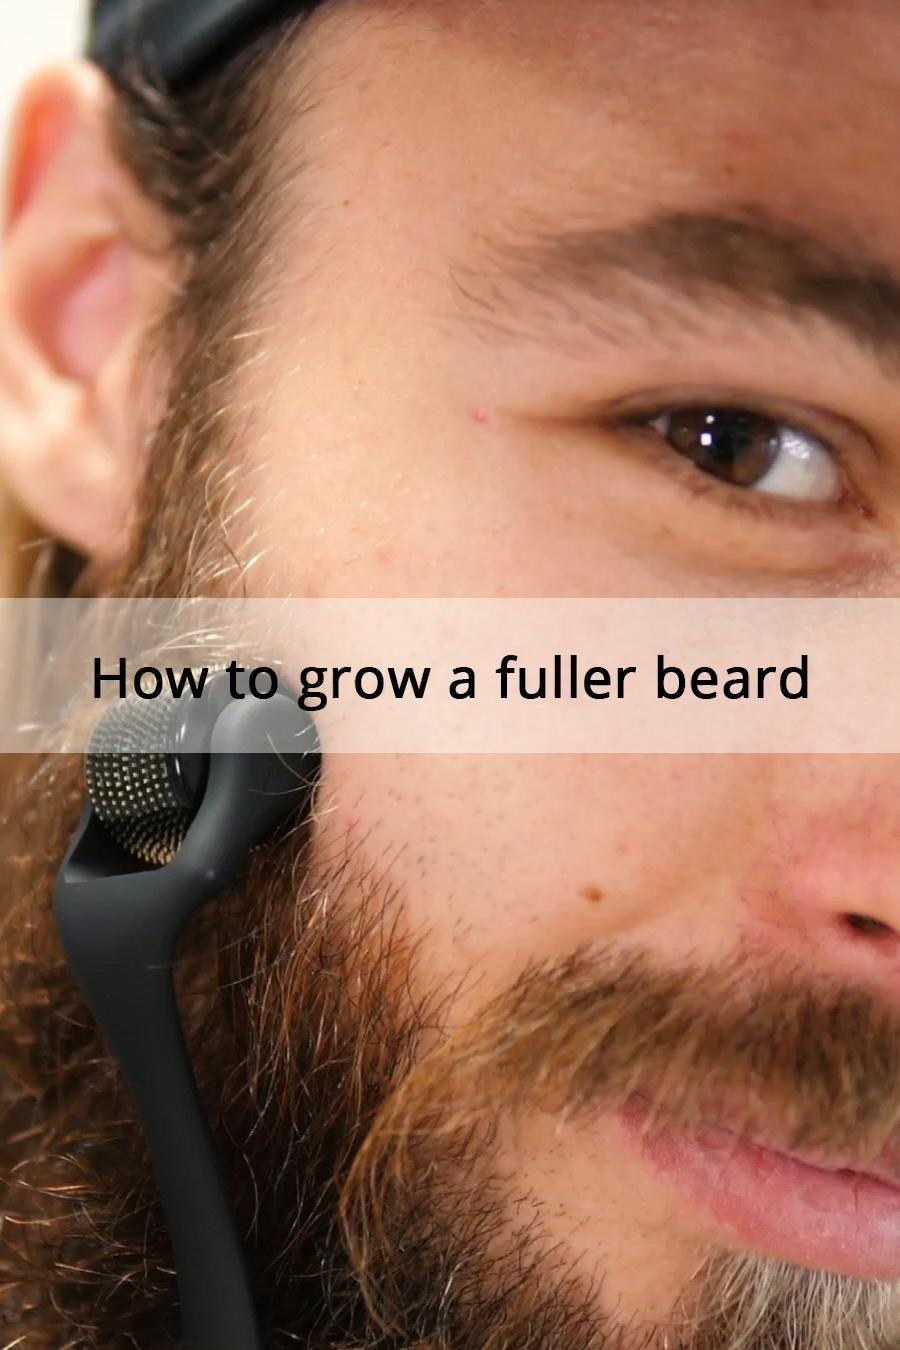 The Beard Growth Kit Copenhagen Grooming Video Video Beard Growth Kit Growing A Full Beard Beard Growth